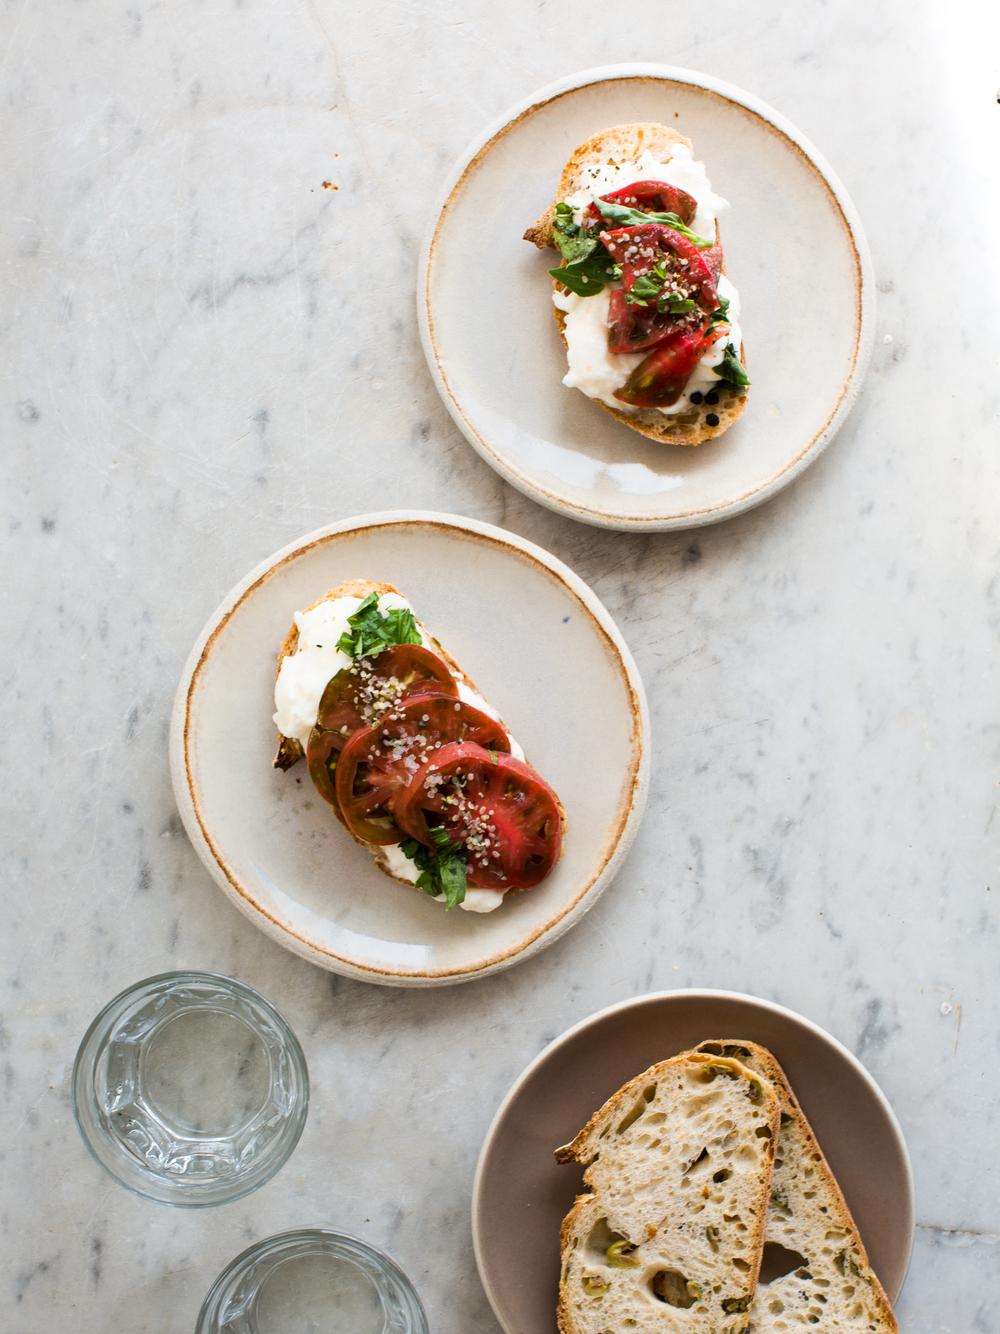 Tomato-and-Burrata-Sourdough-Toast | www.8thandlake.com